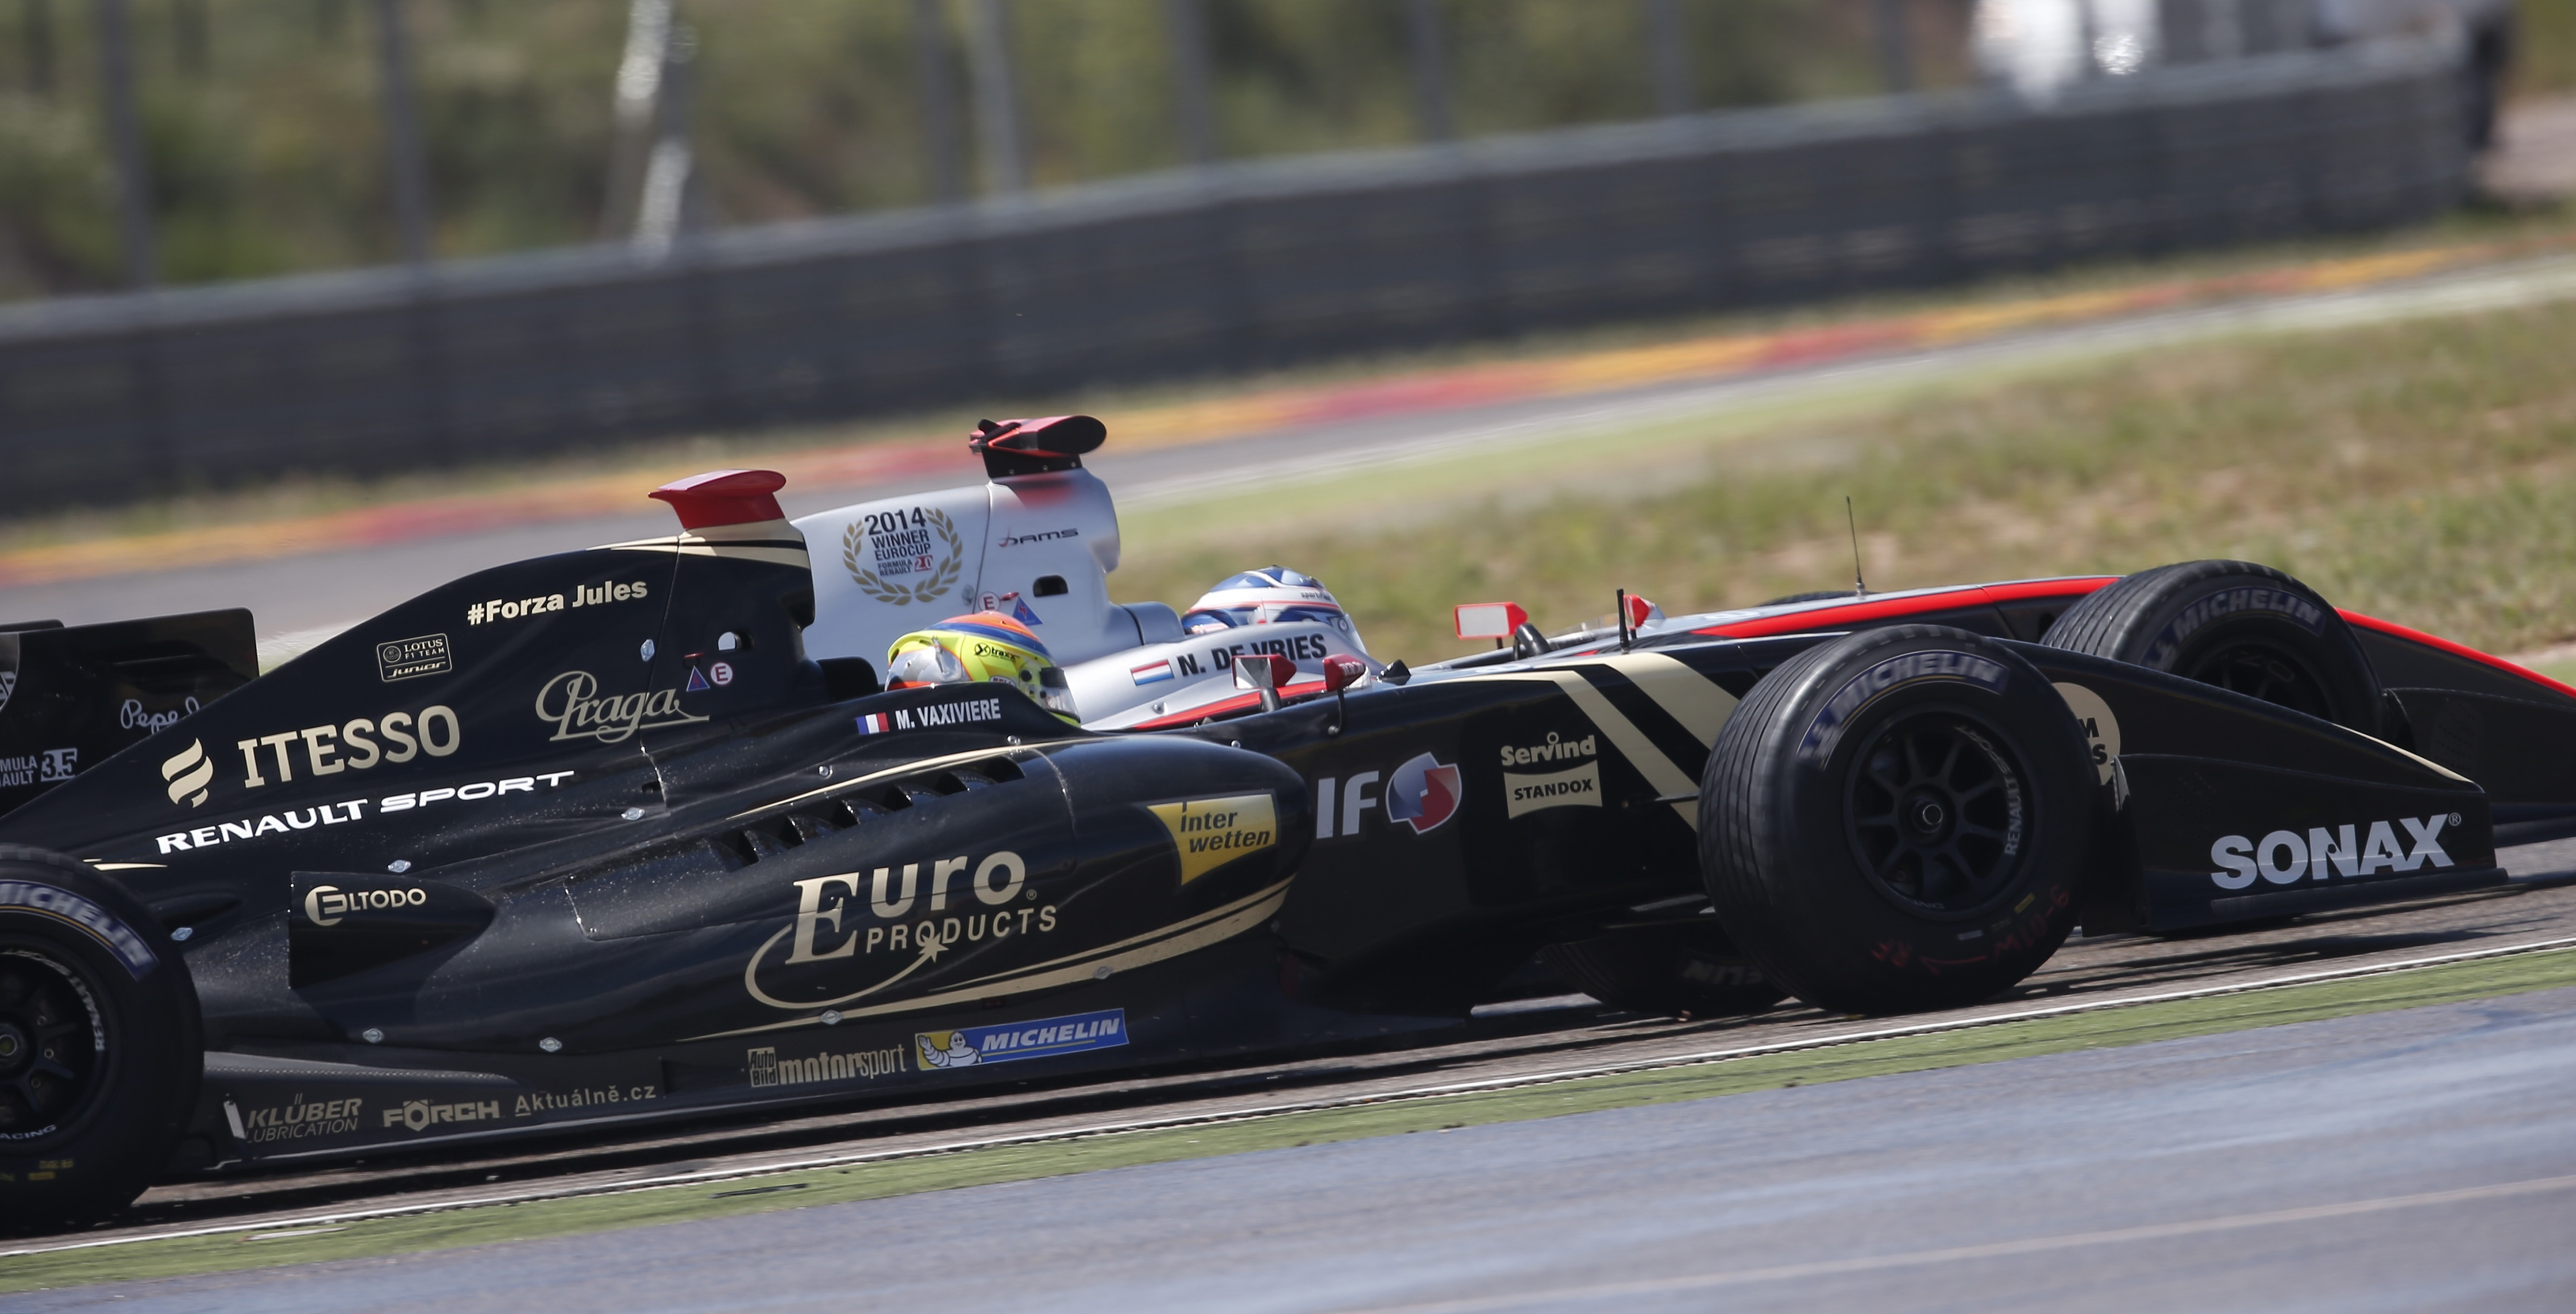 AUTO - WSR MOTORLAND ARAGON 2015